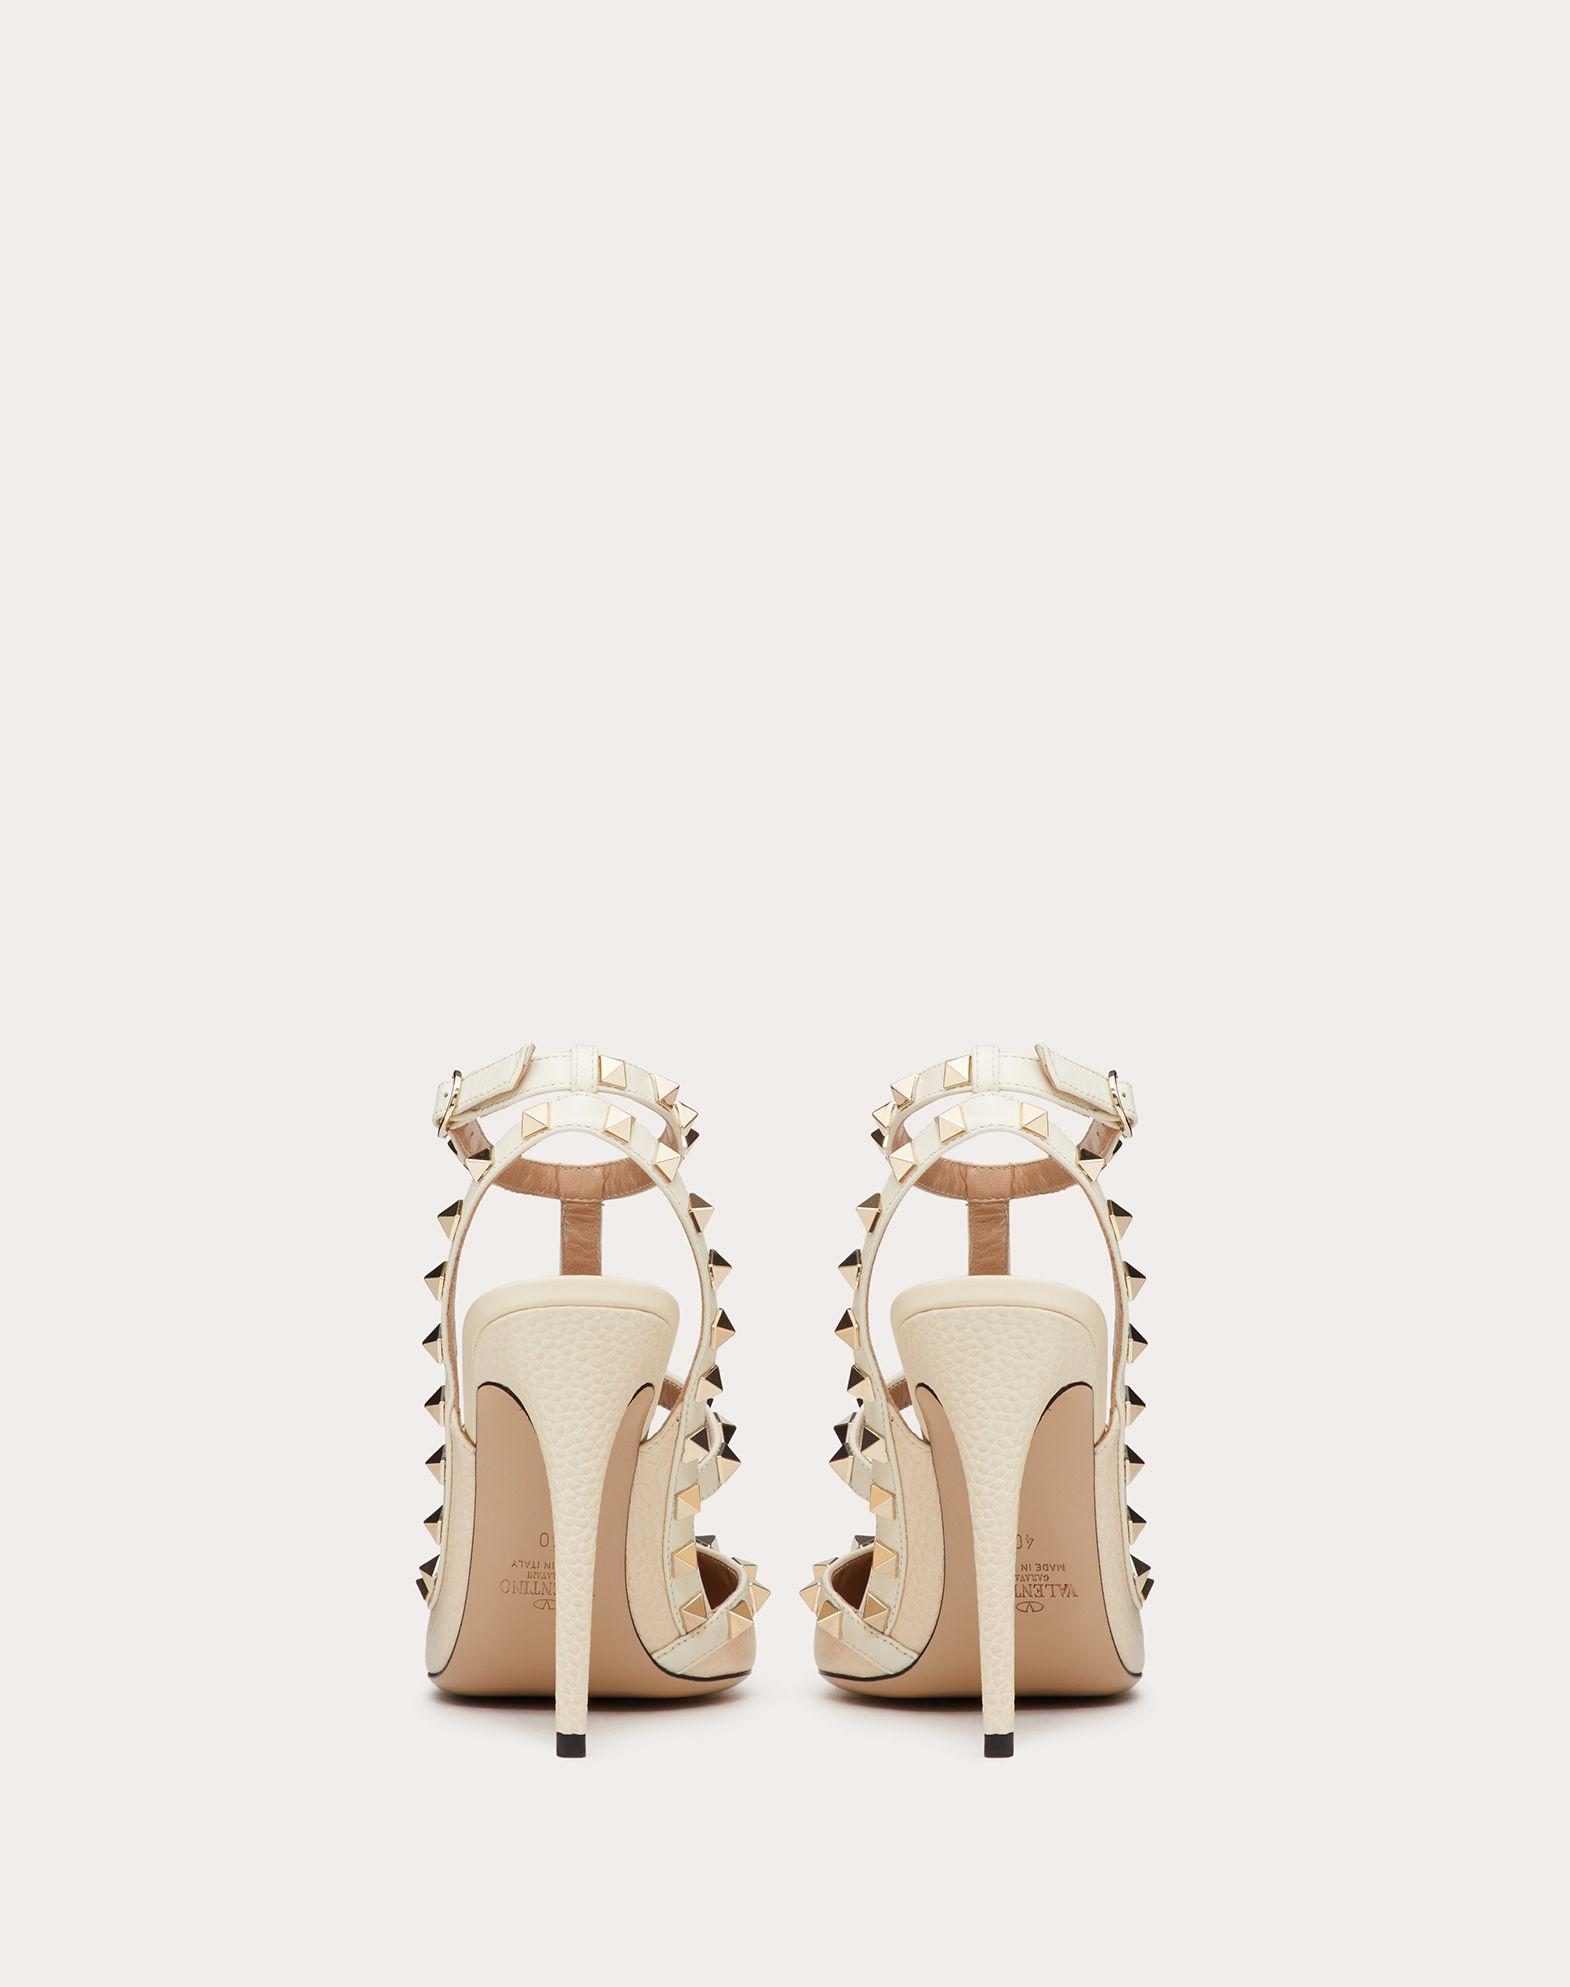 VALENTINO GARAVANI Rockstud Ankle Strap HIGH HEEL PUMPS D d